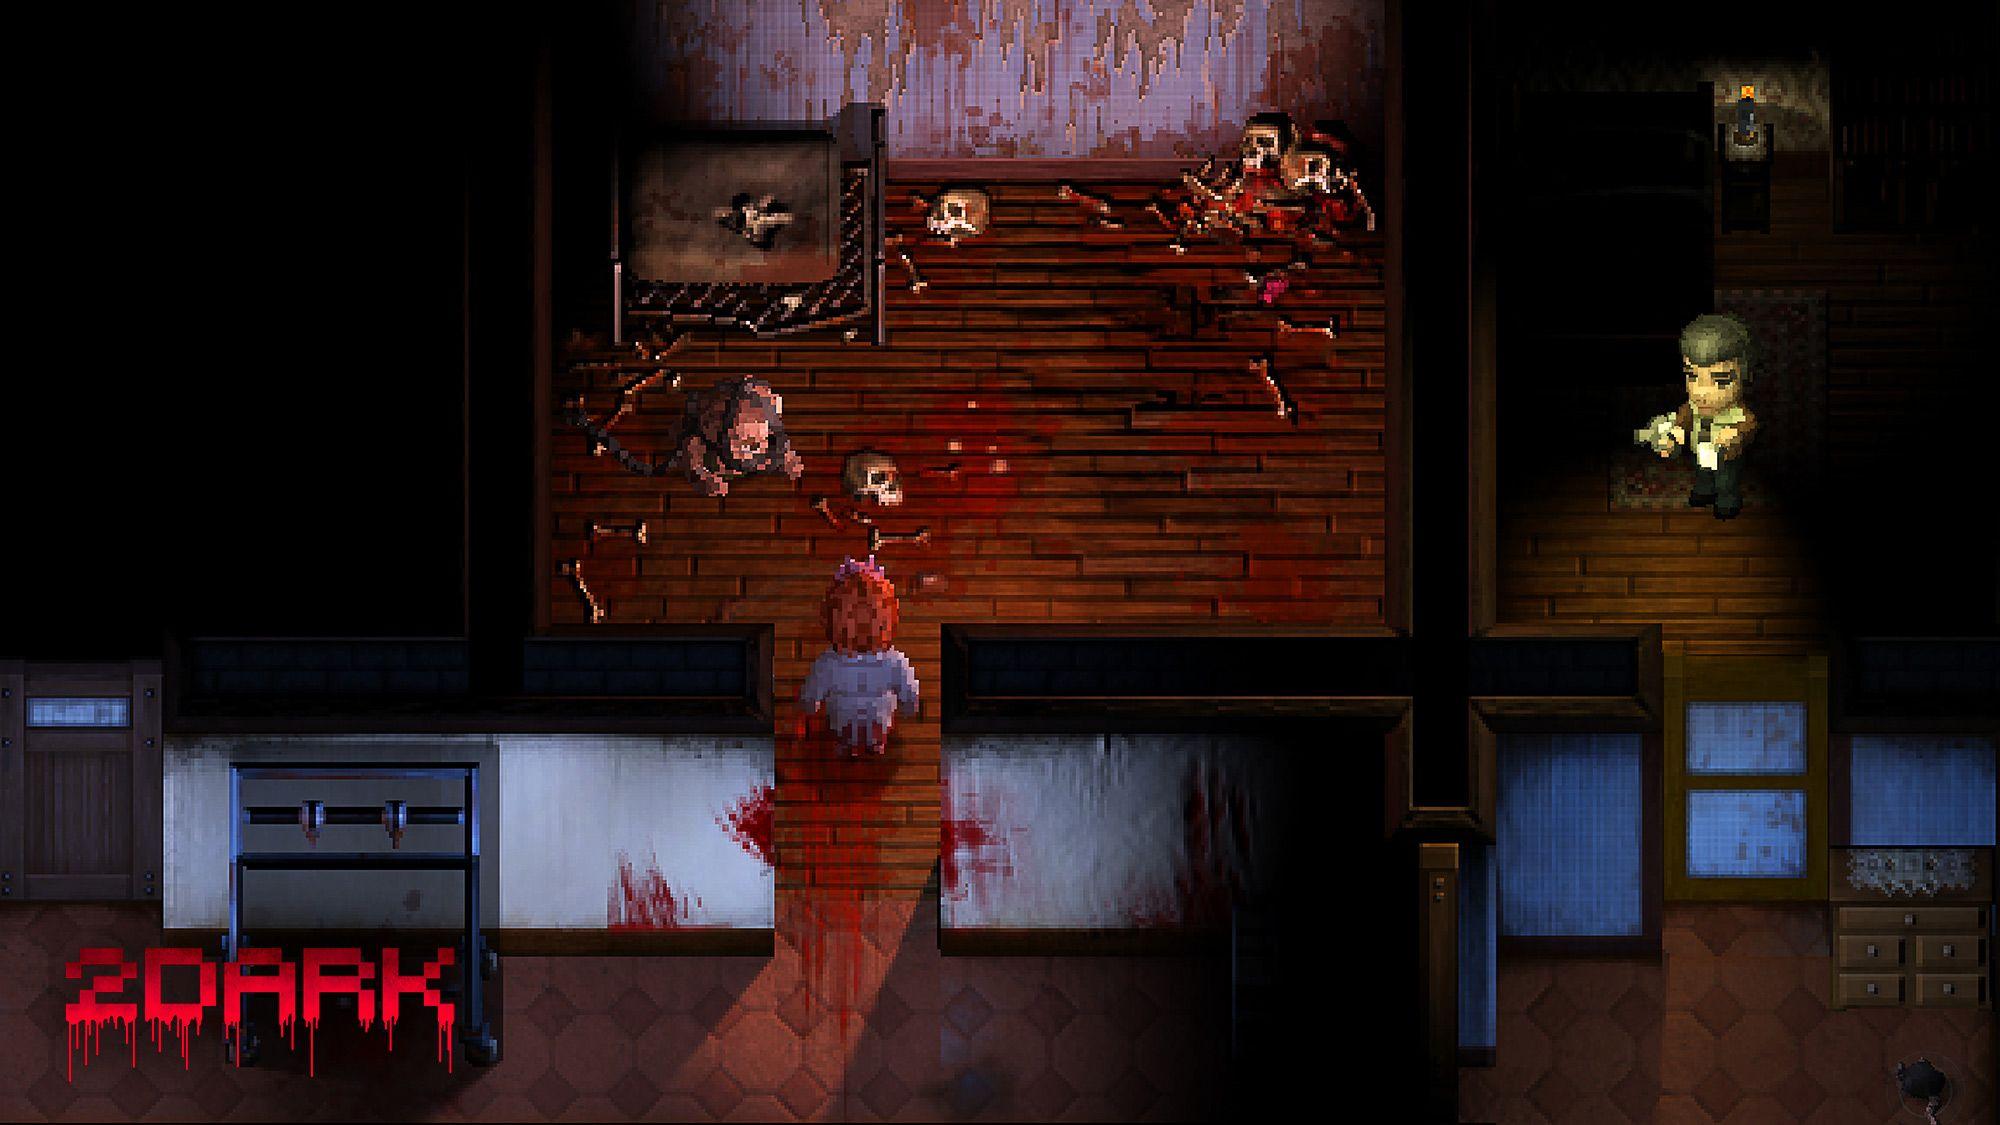 2Dark (PS4) - gruesomely dull